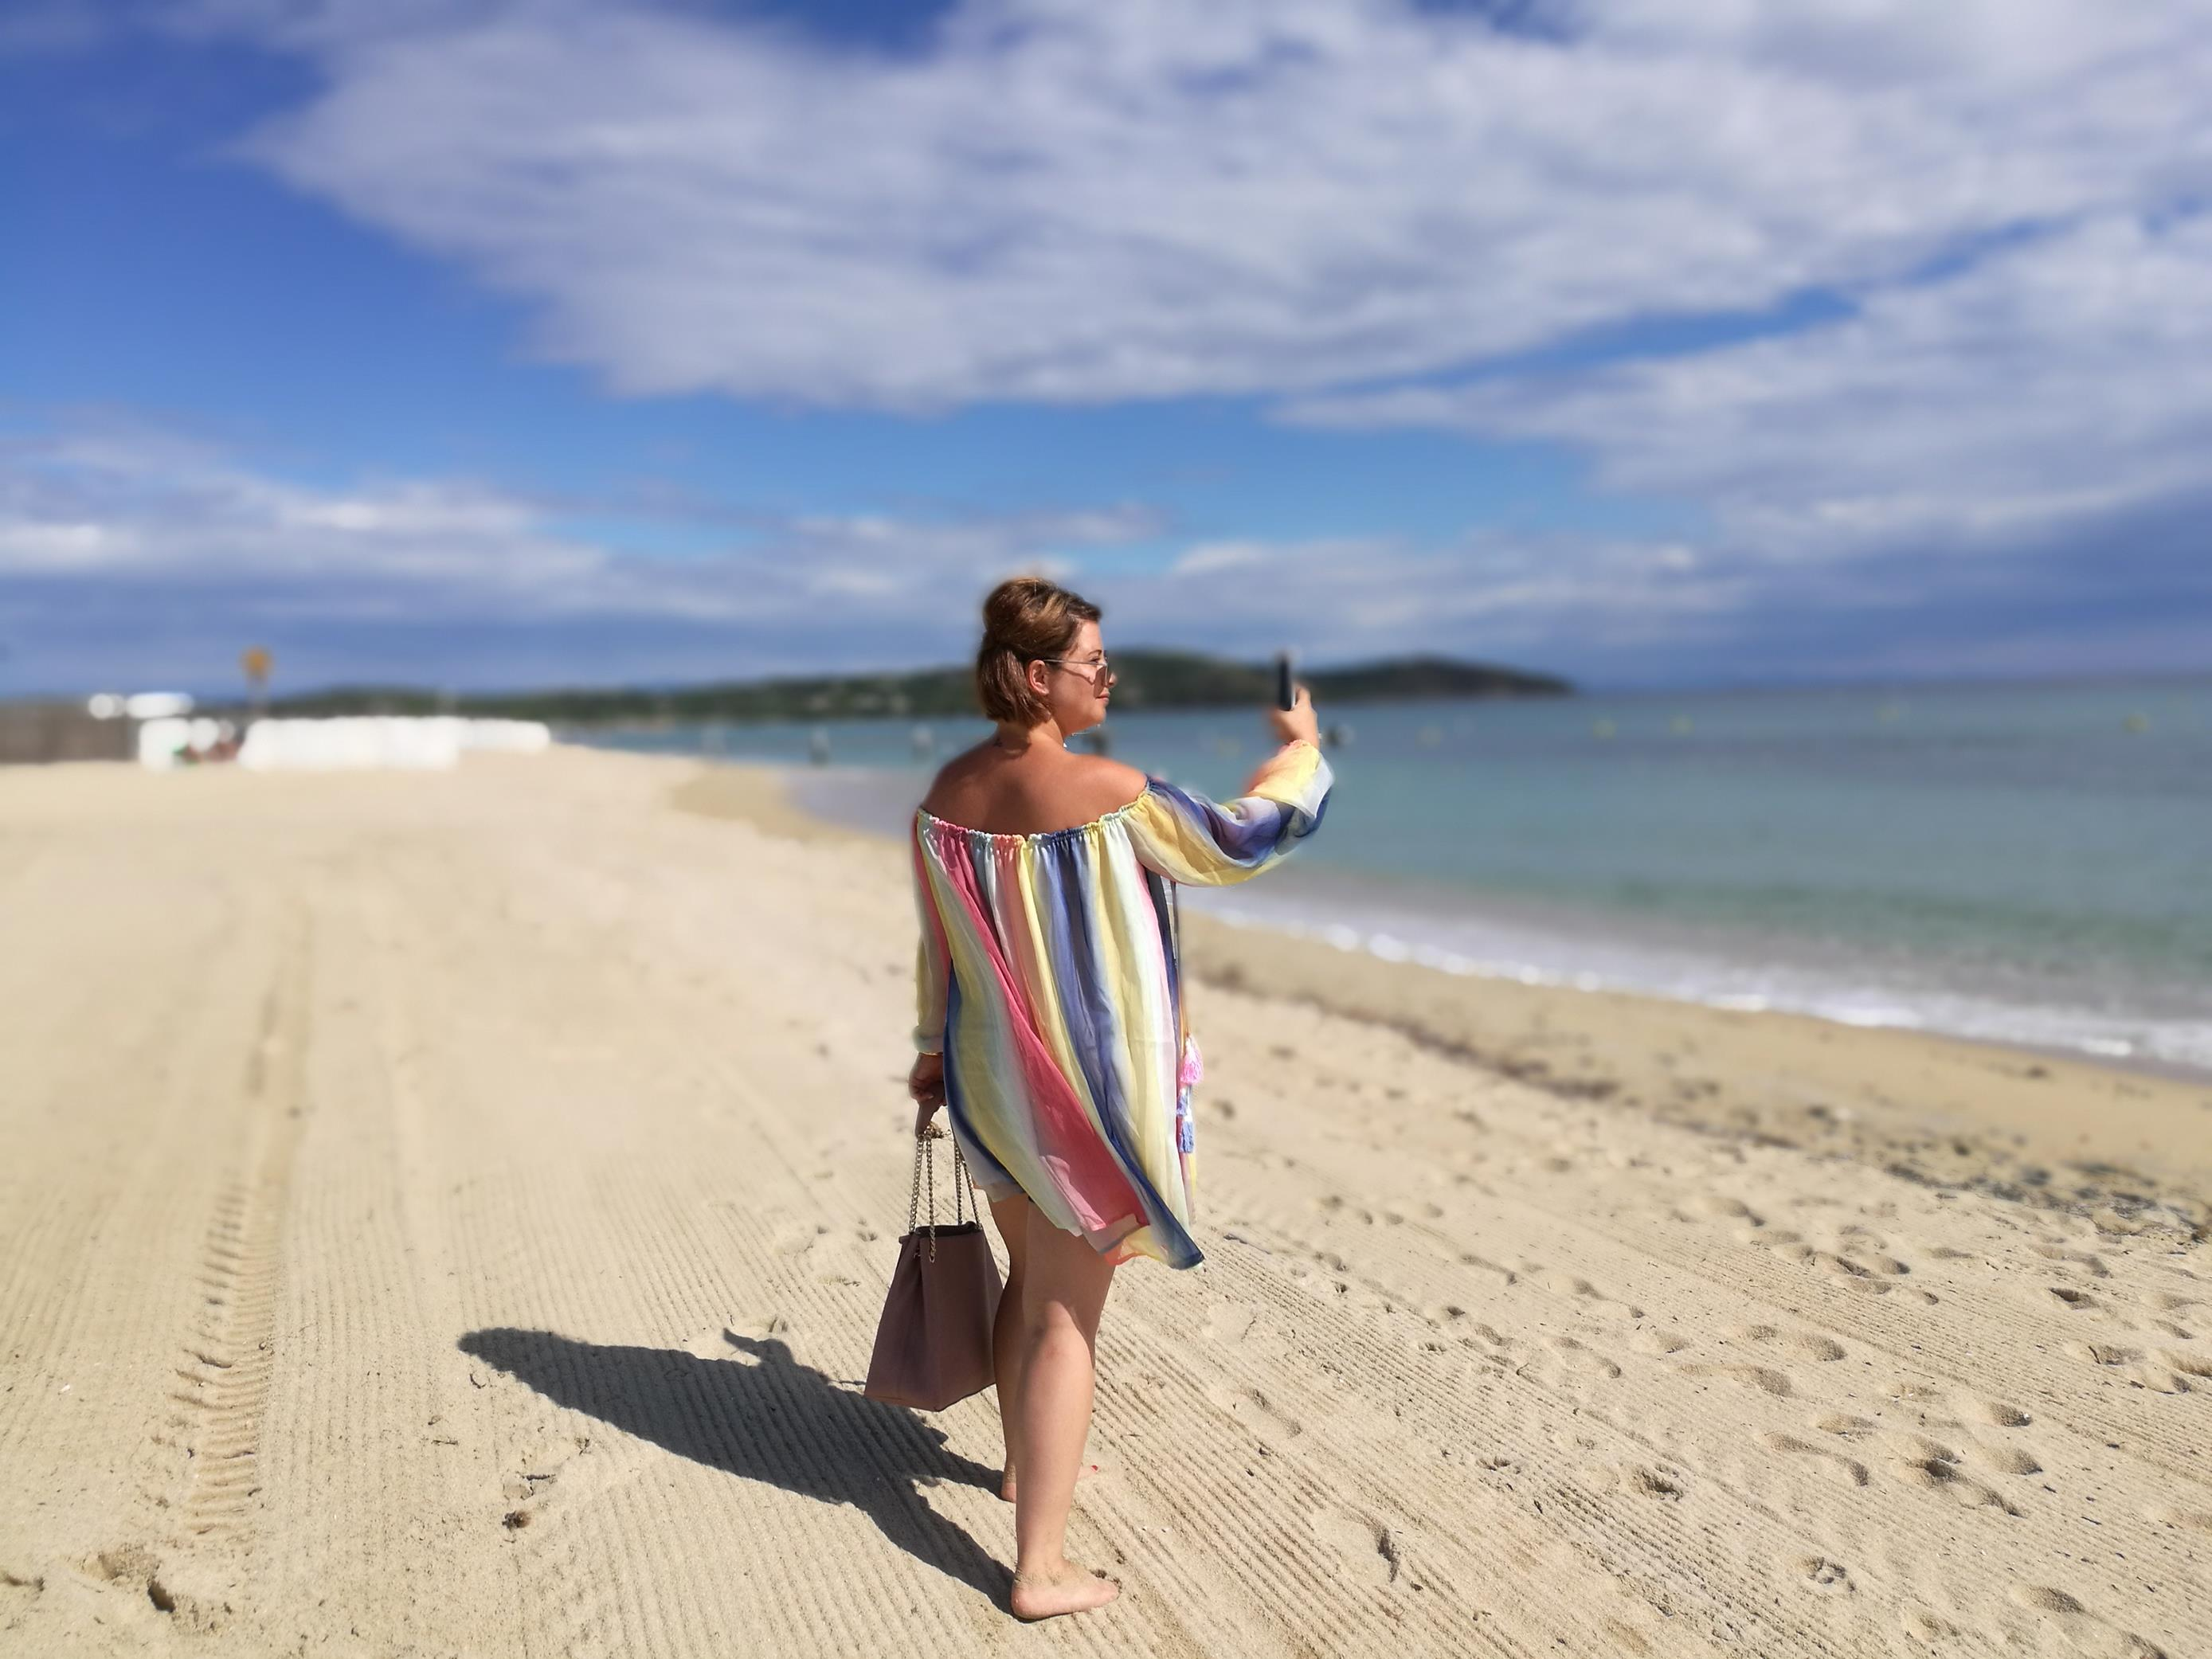 St. Tropez Beach